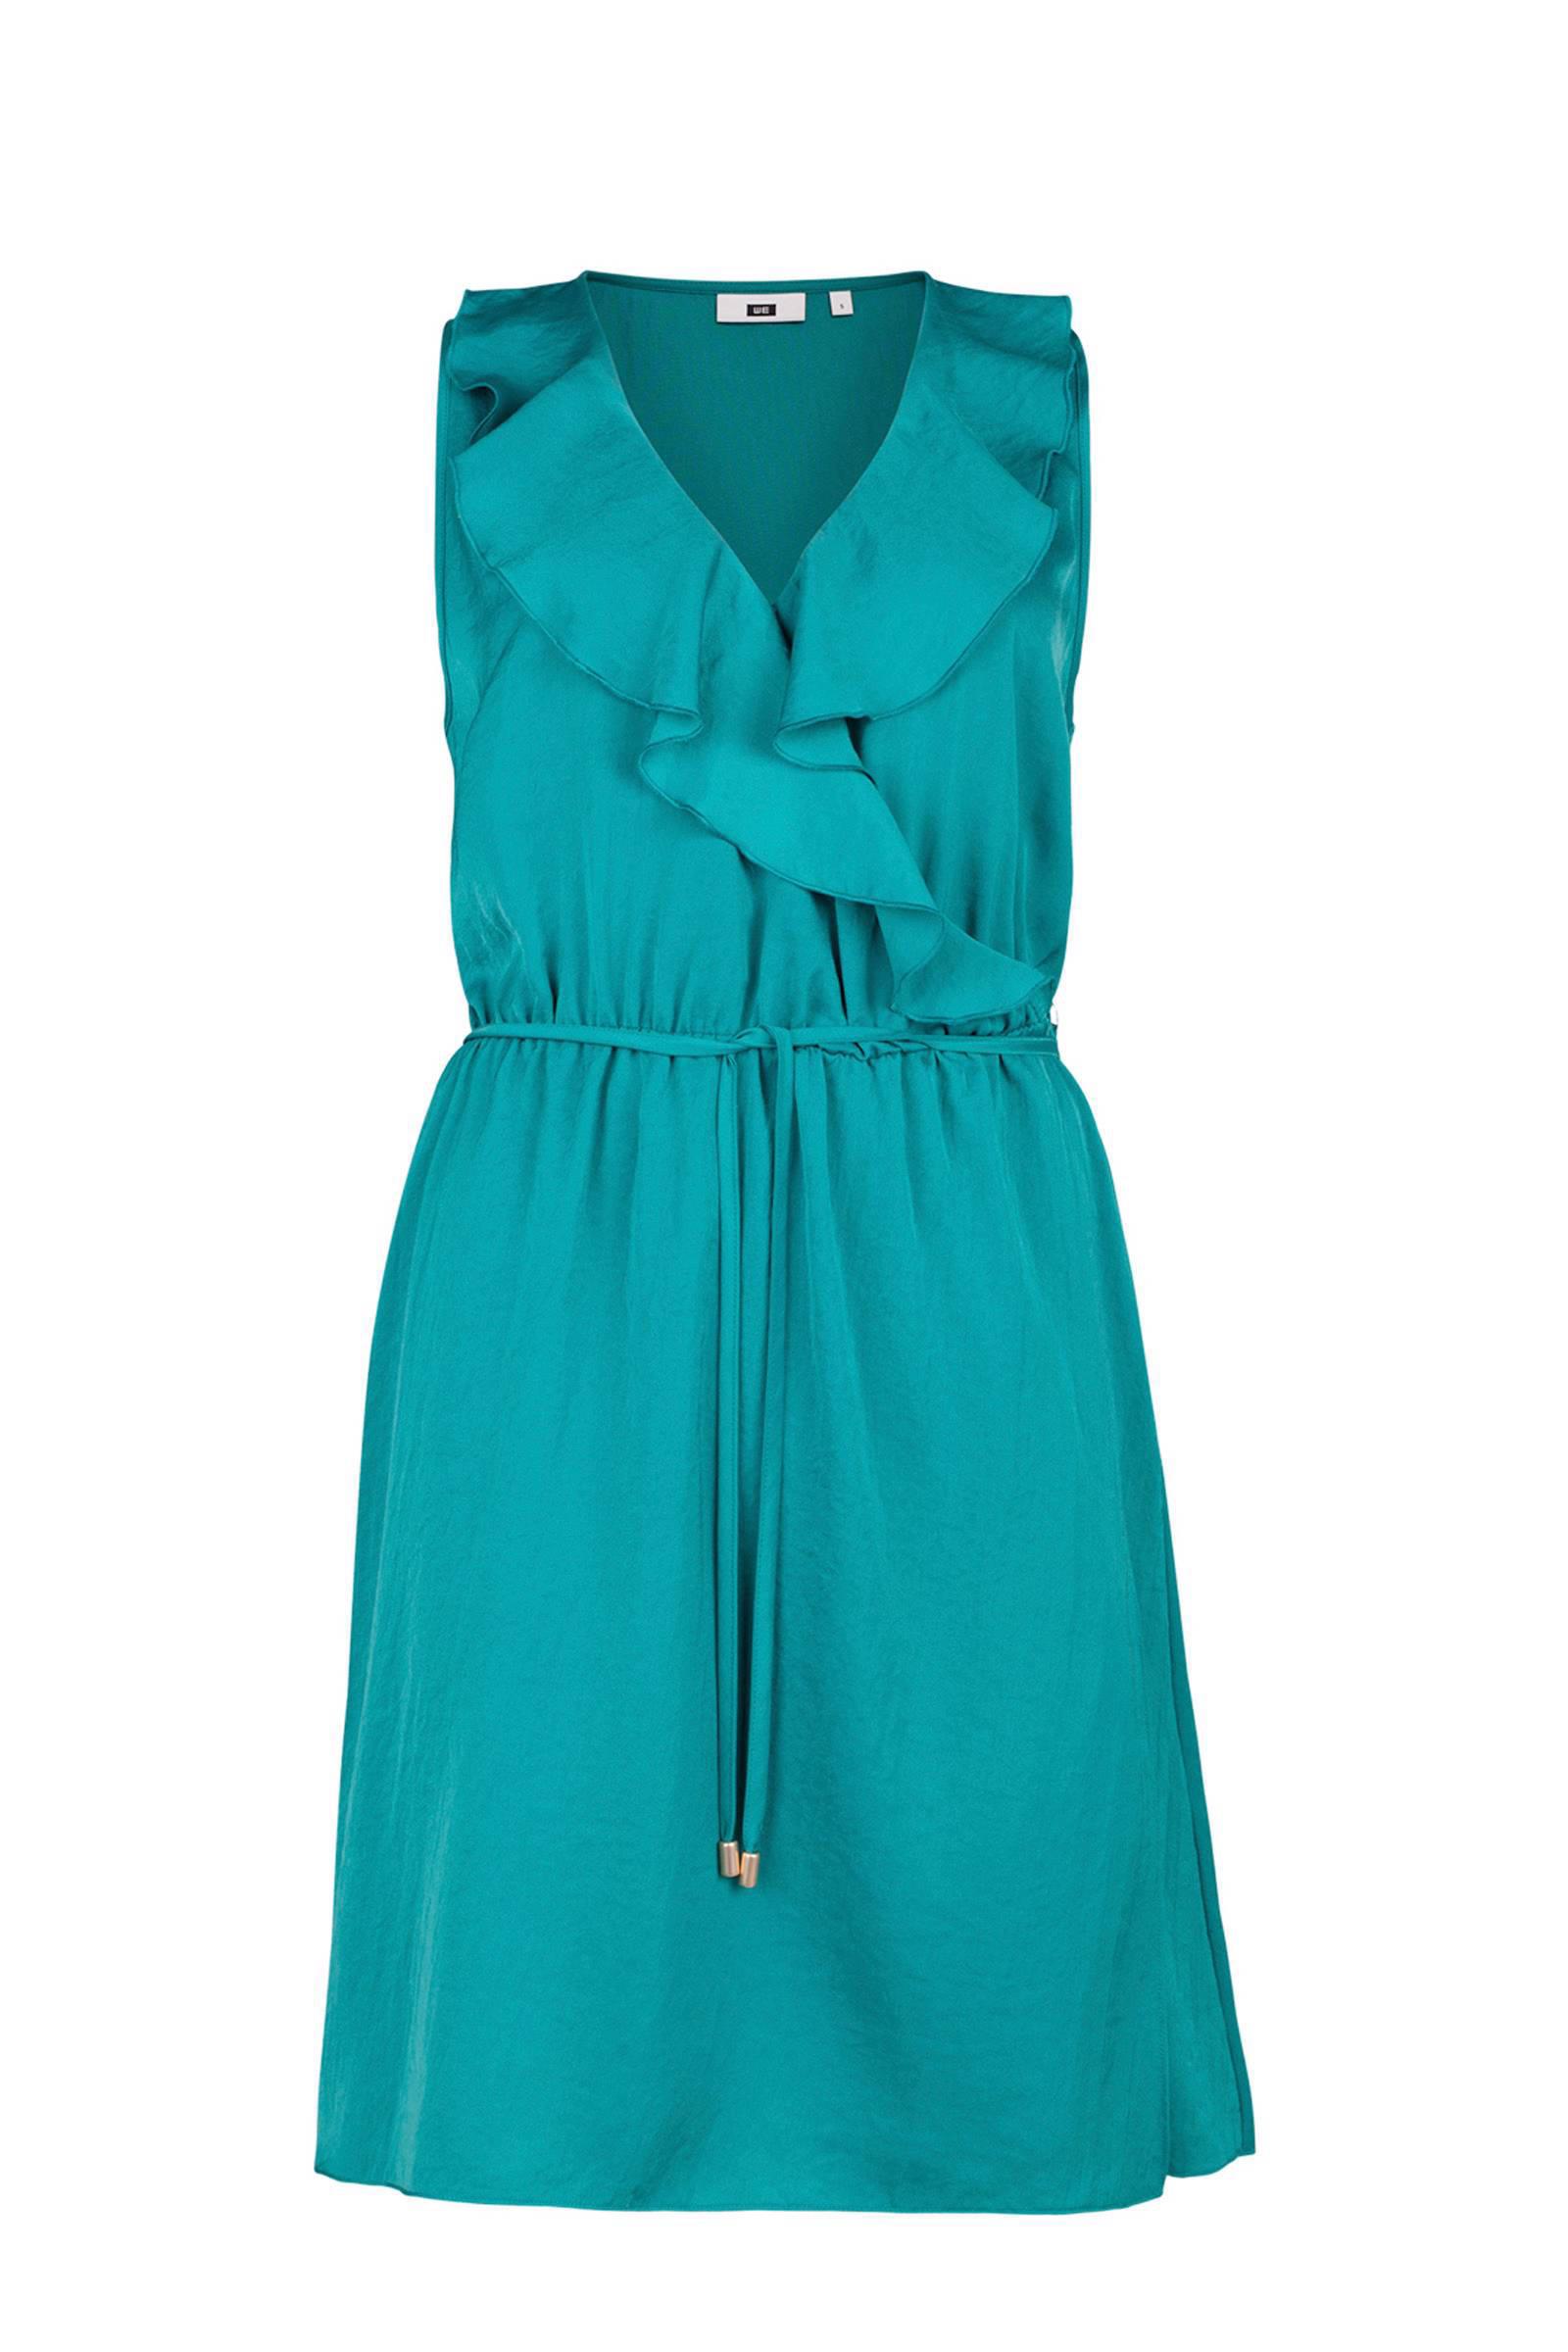 turquoise jurk